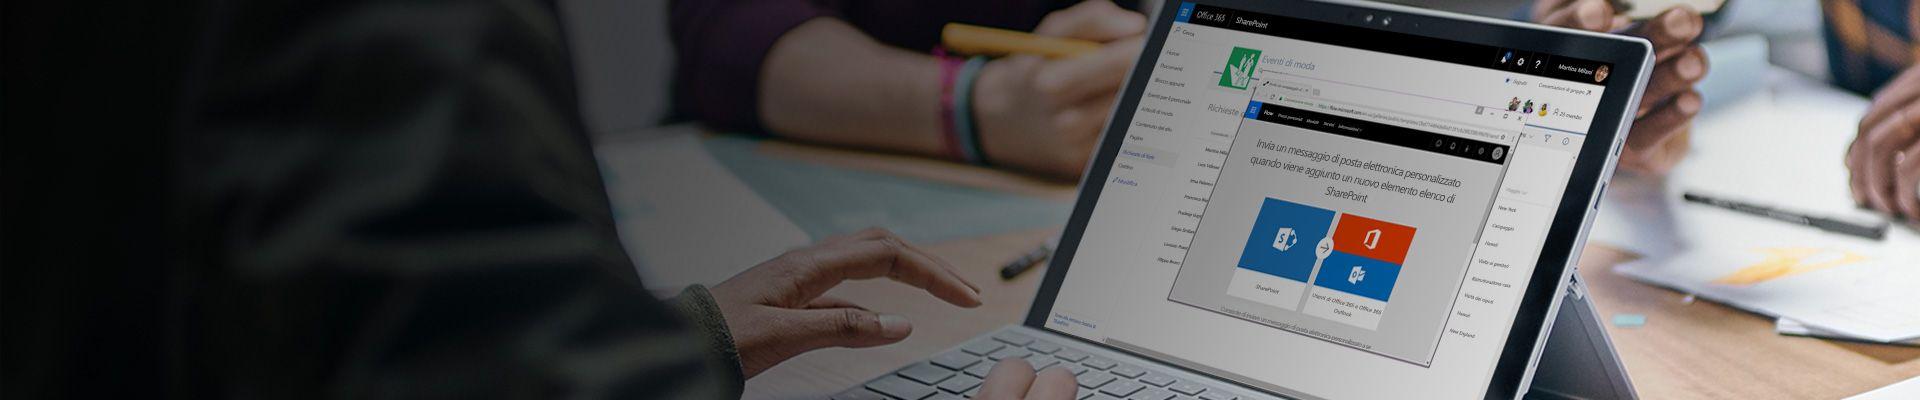 Flow e SharePoint in esecuzione su un portatile